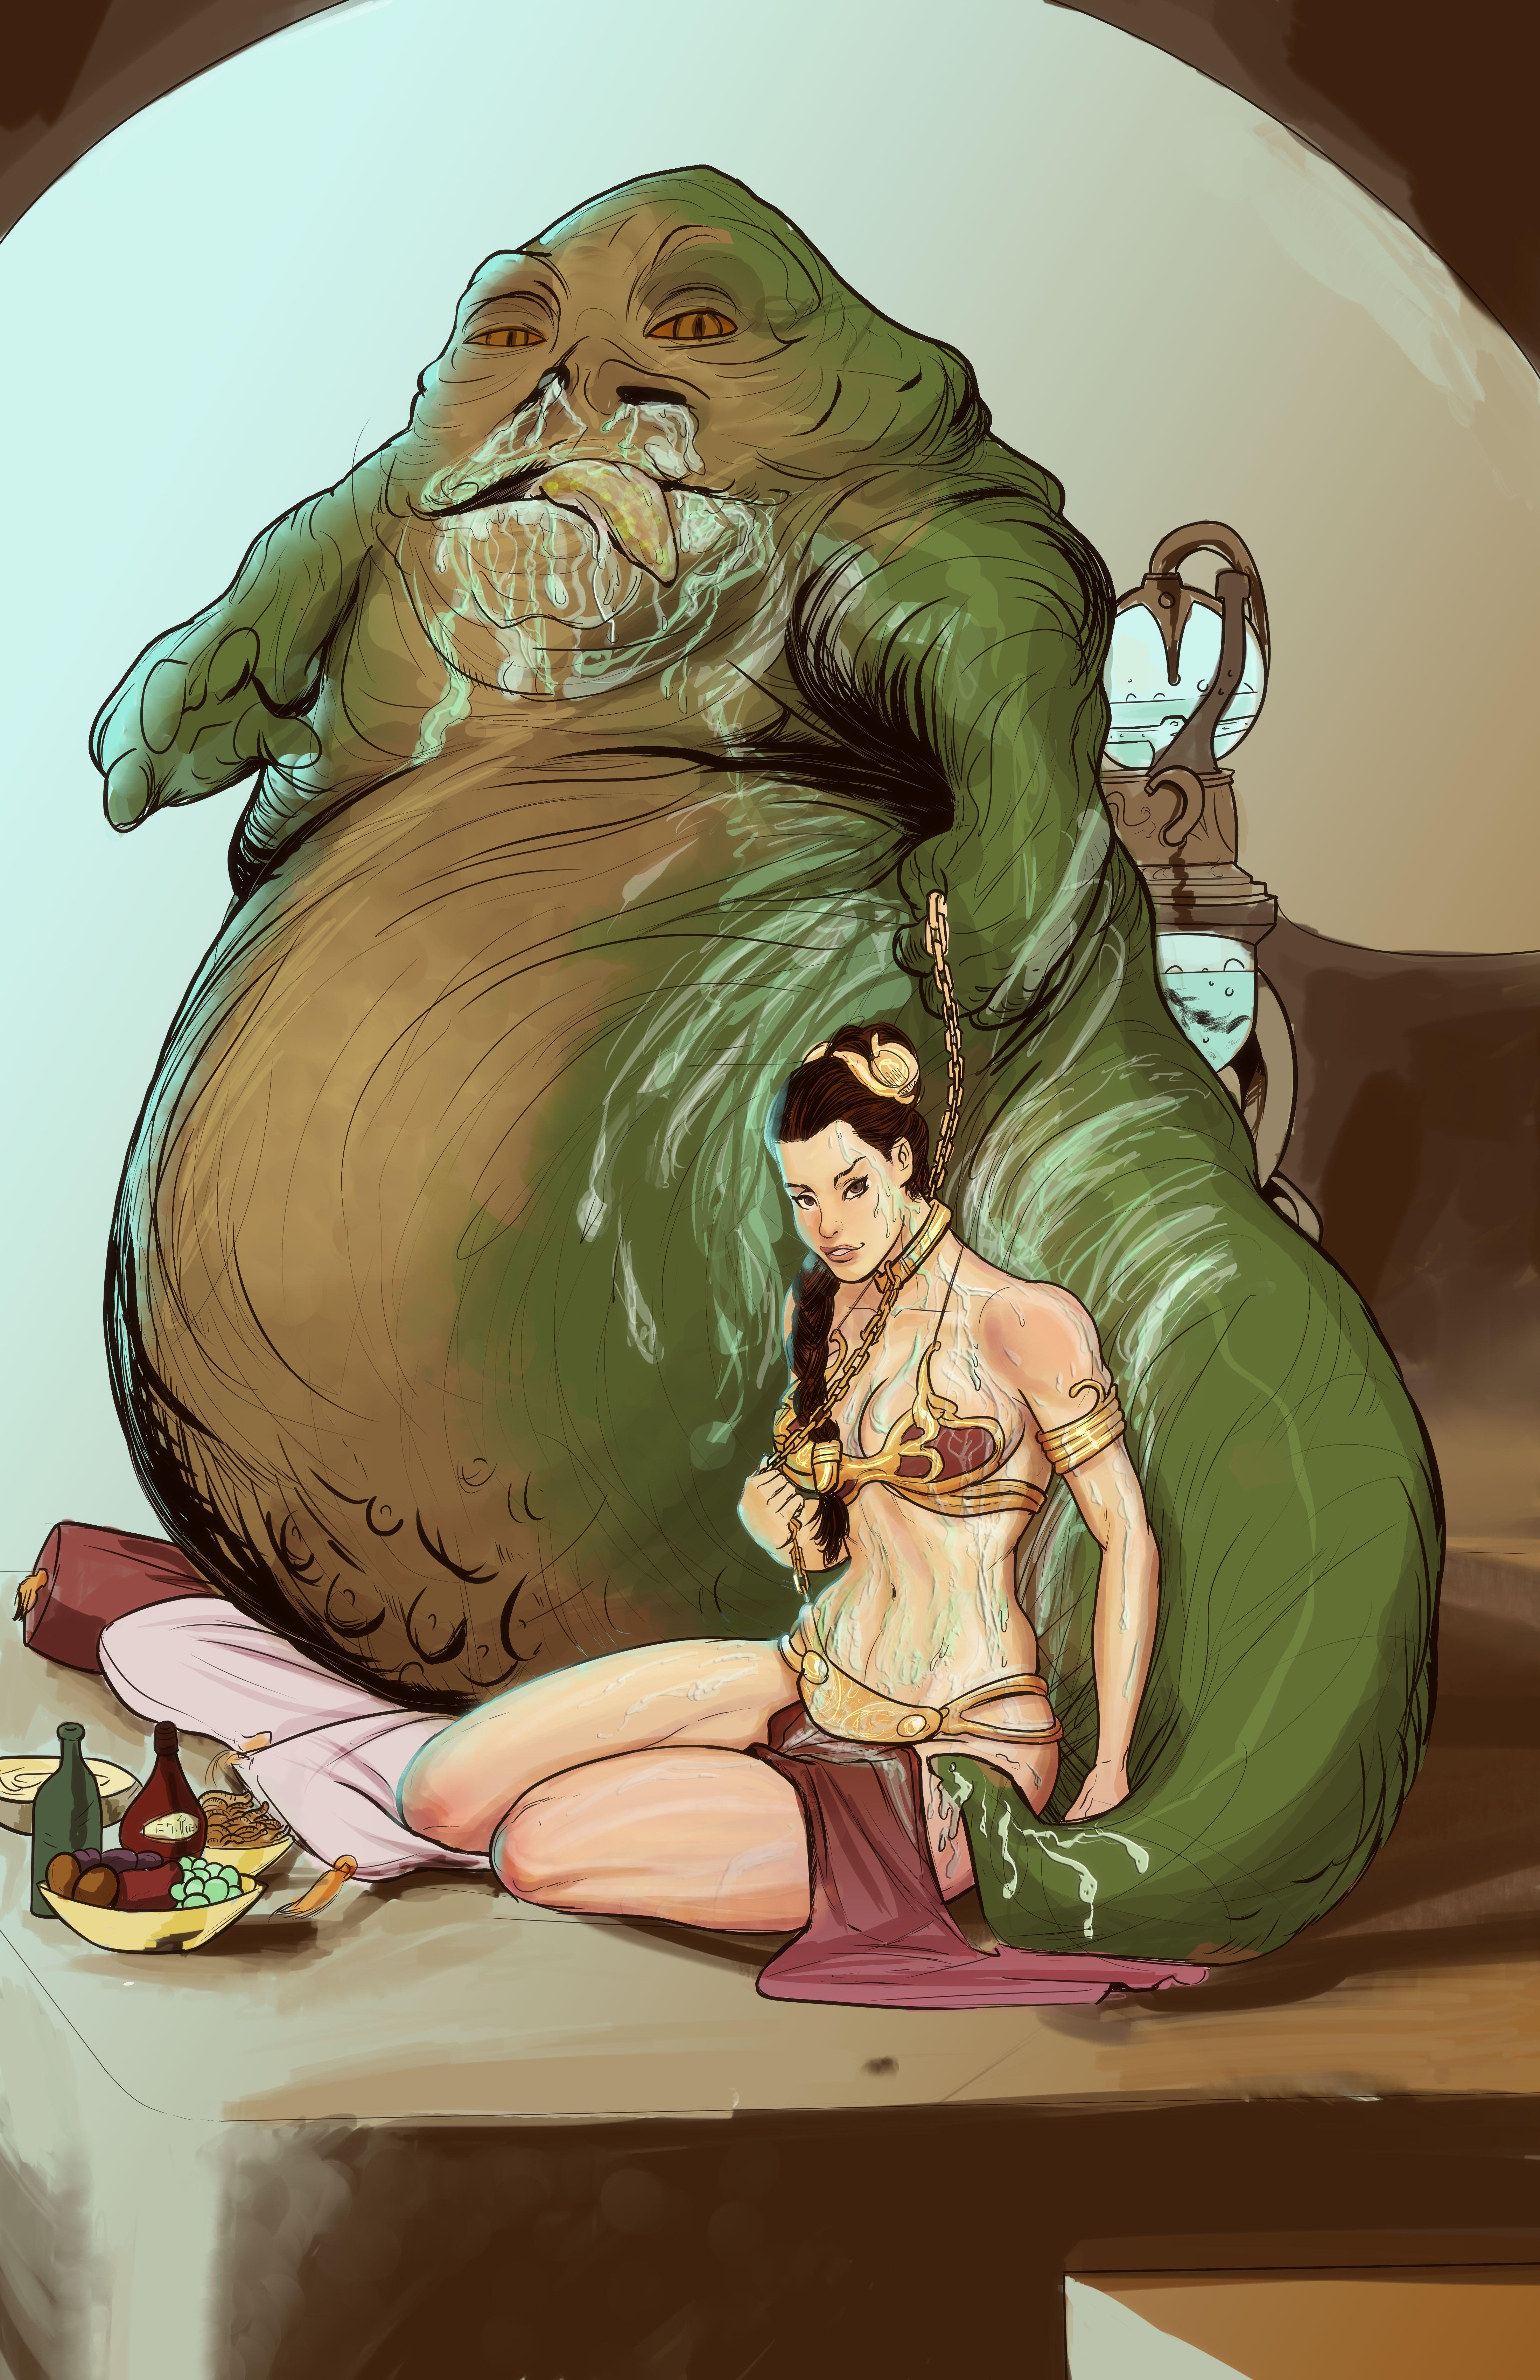 Jabba The Hutt Fucks Princess Leia Delightful star wars - leia and jabba the hutt colorheyserdna   princess